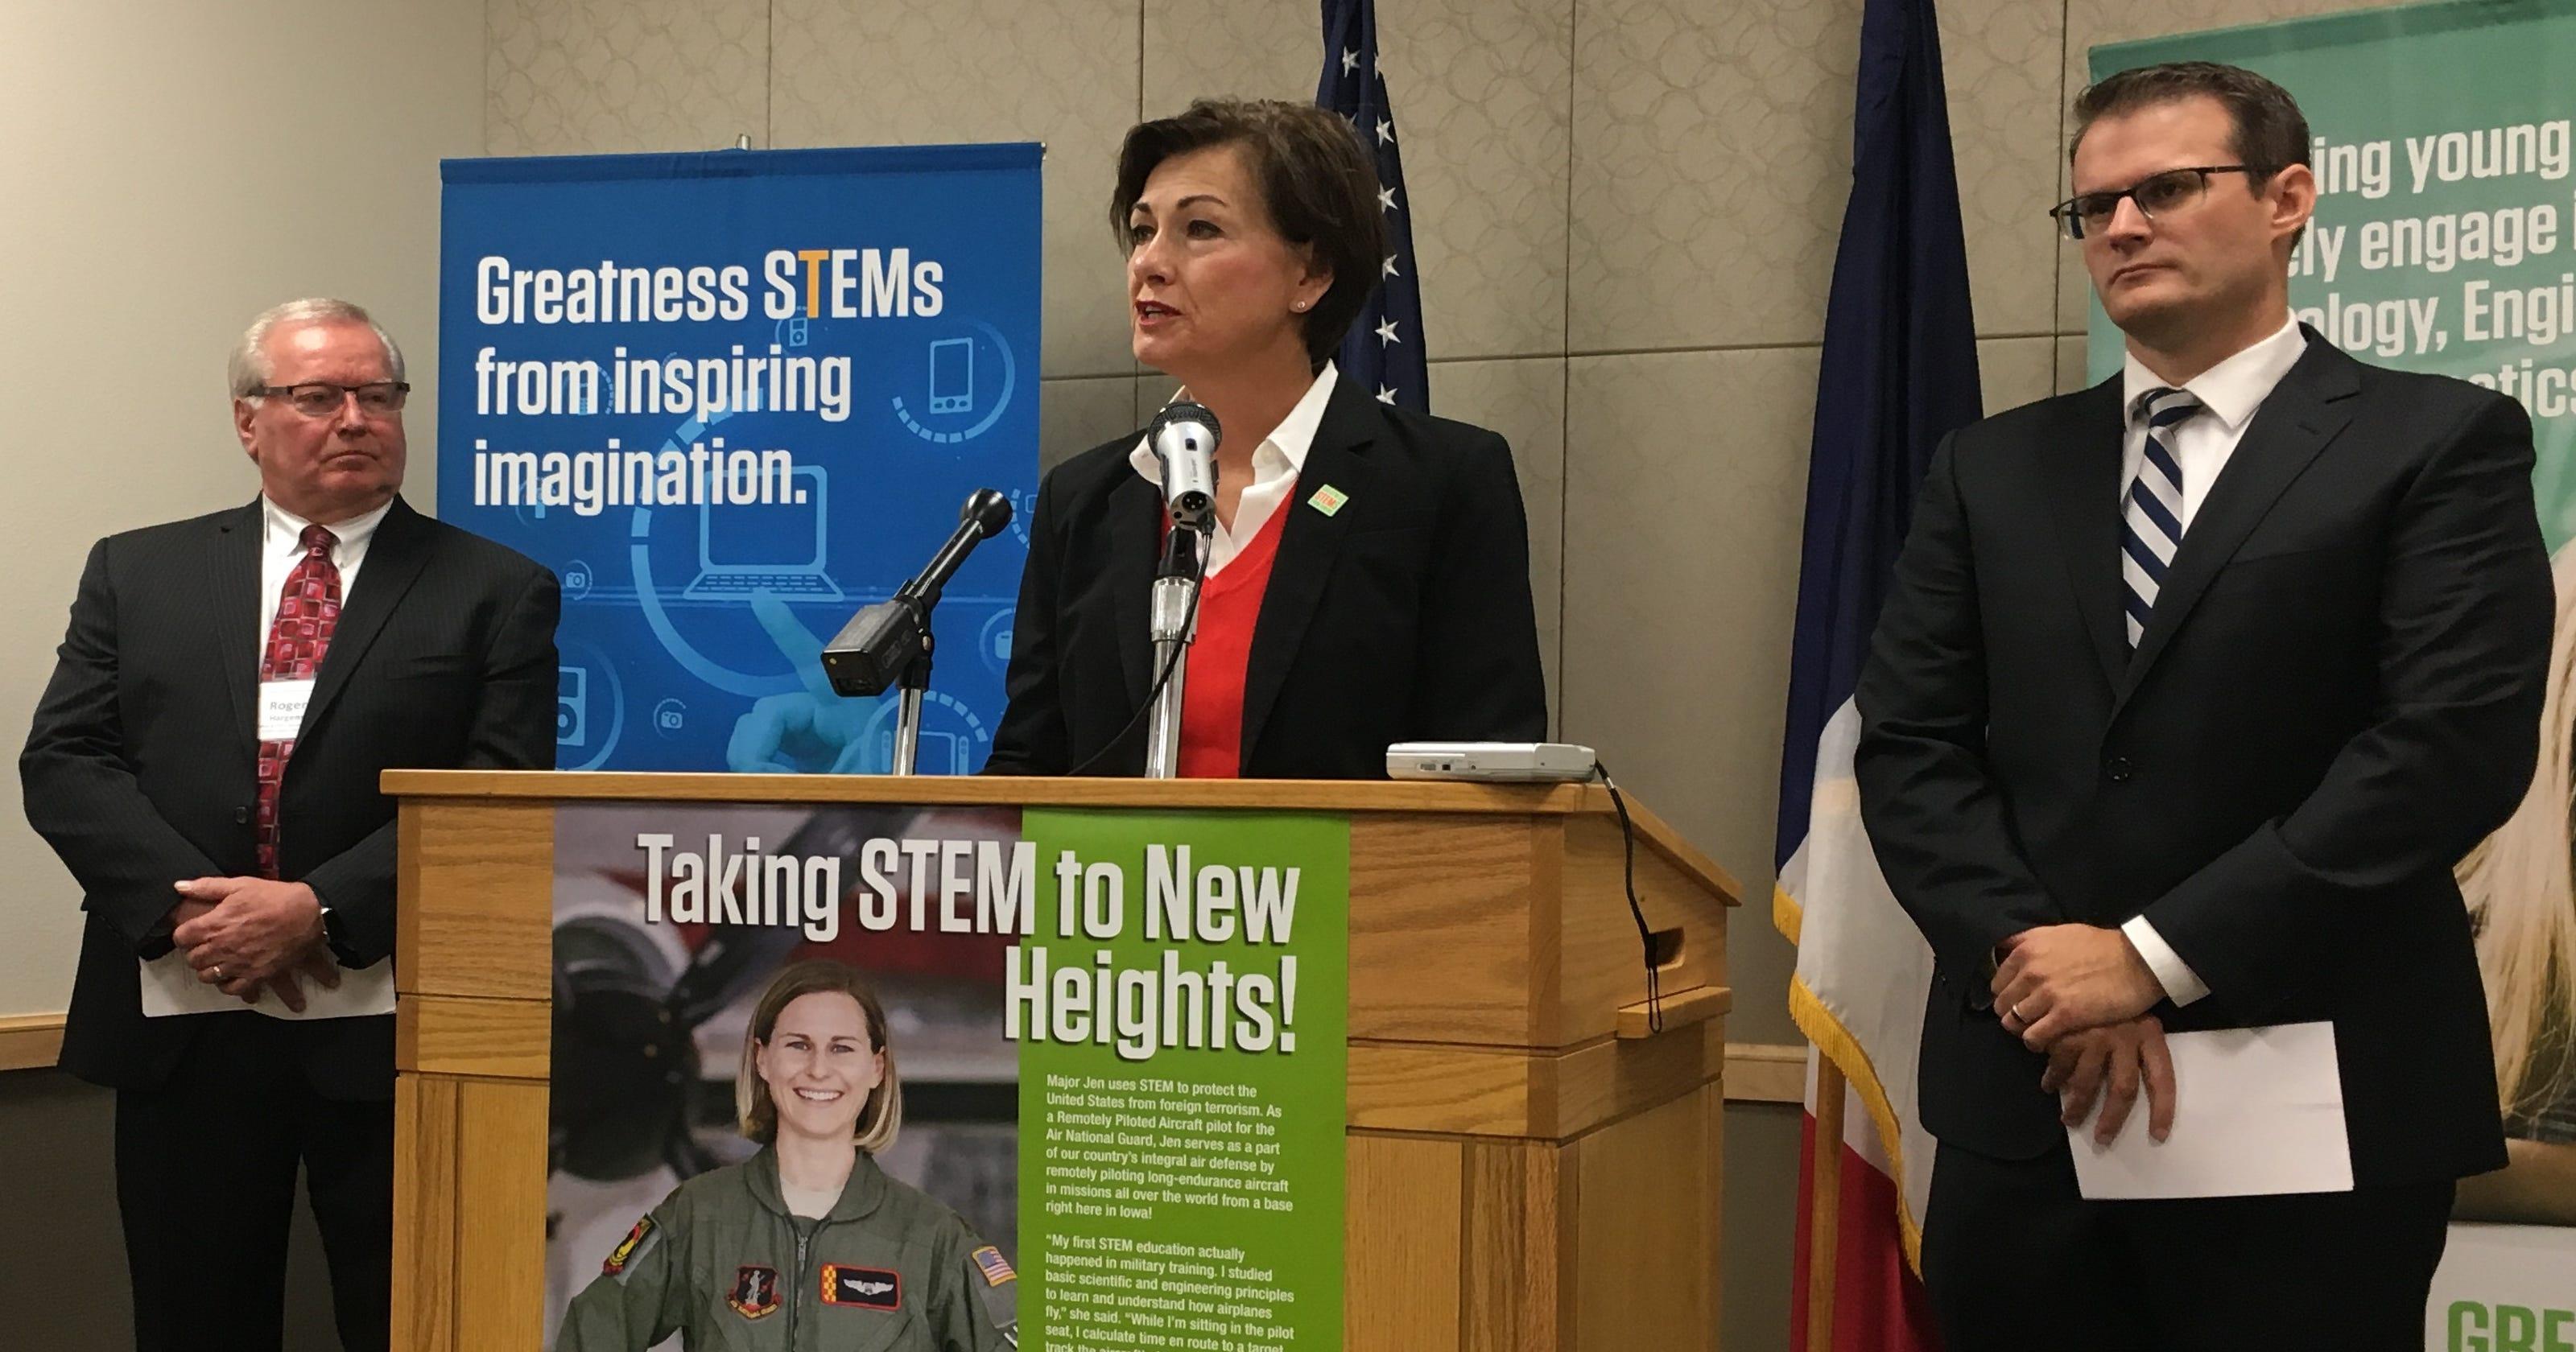 Iowa STEM jobs pay 15 percent less than national average